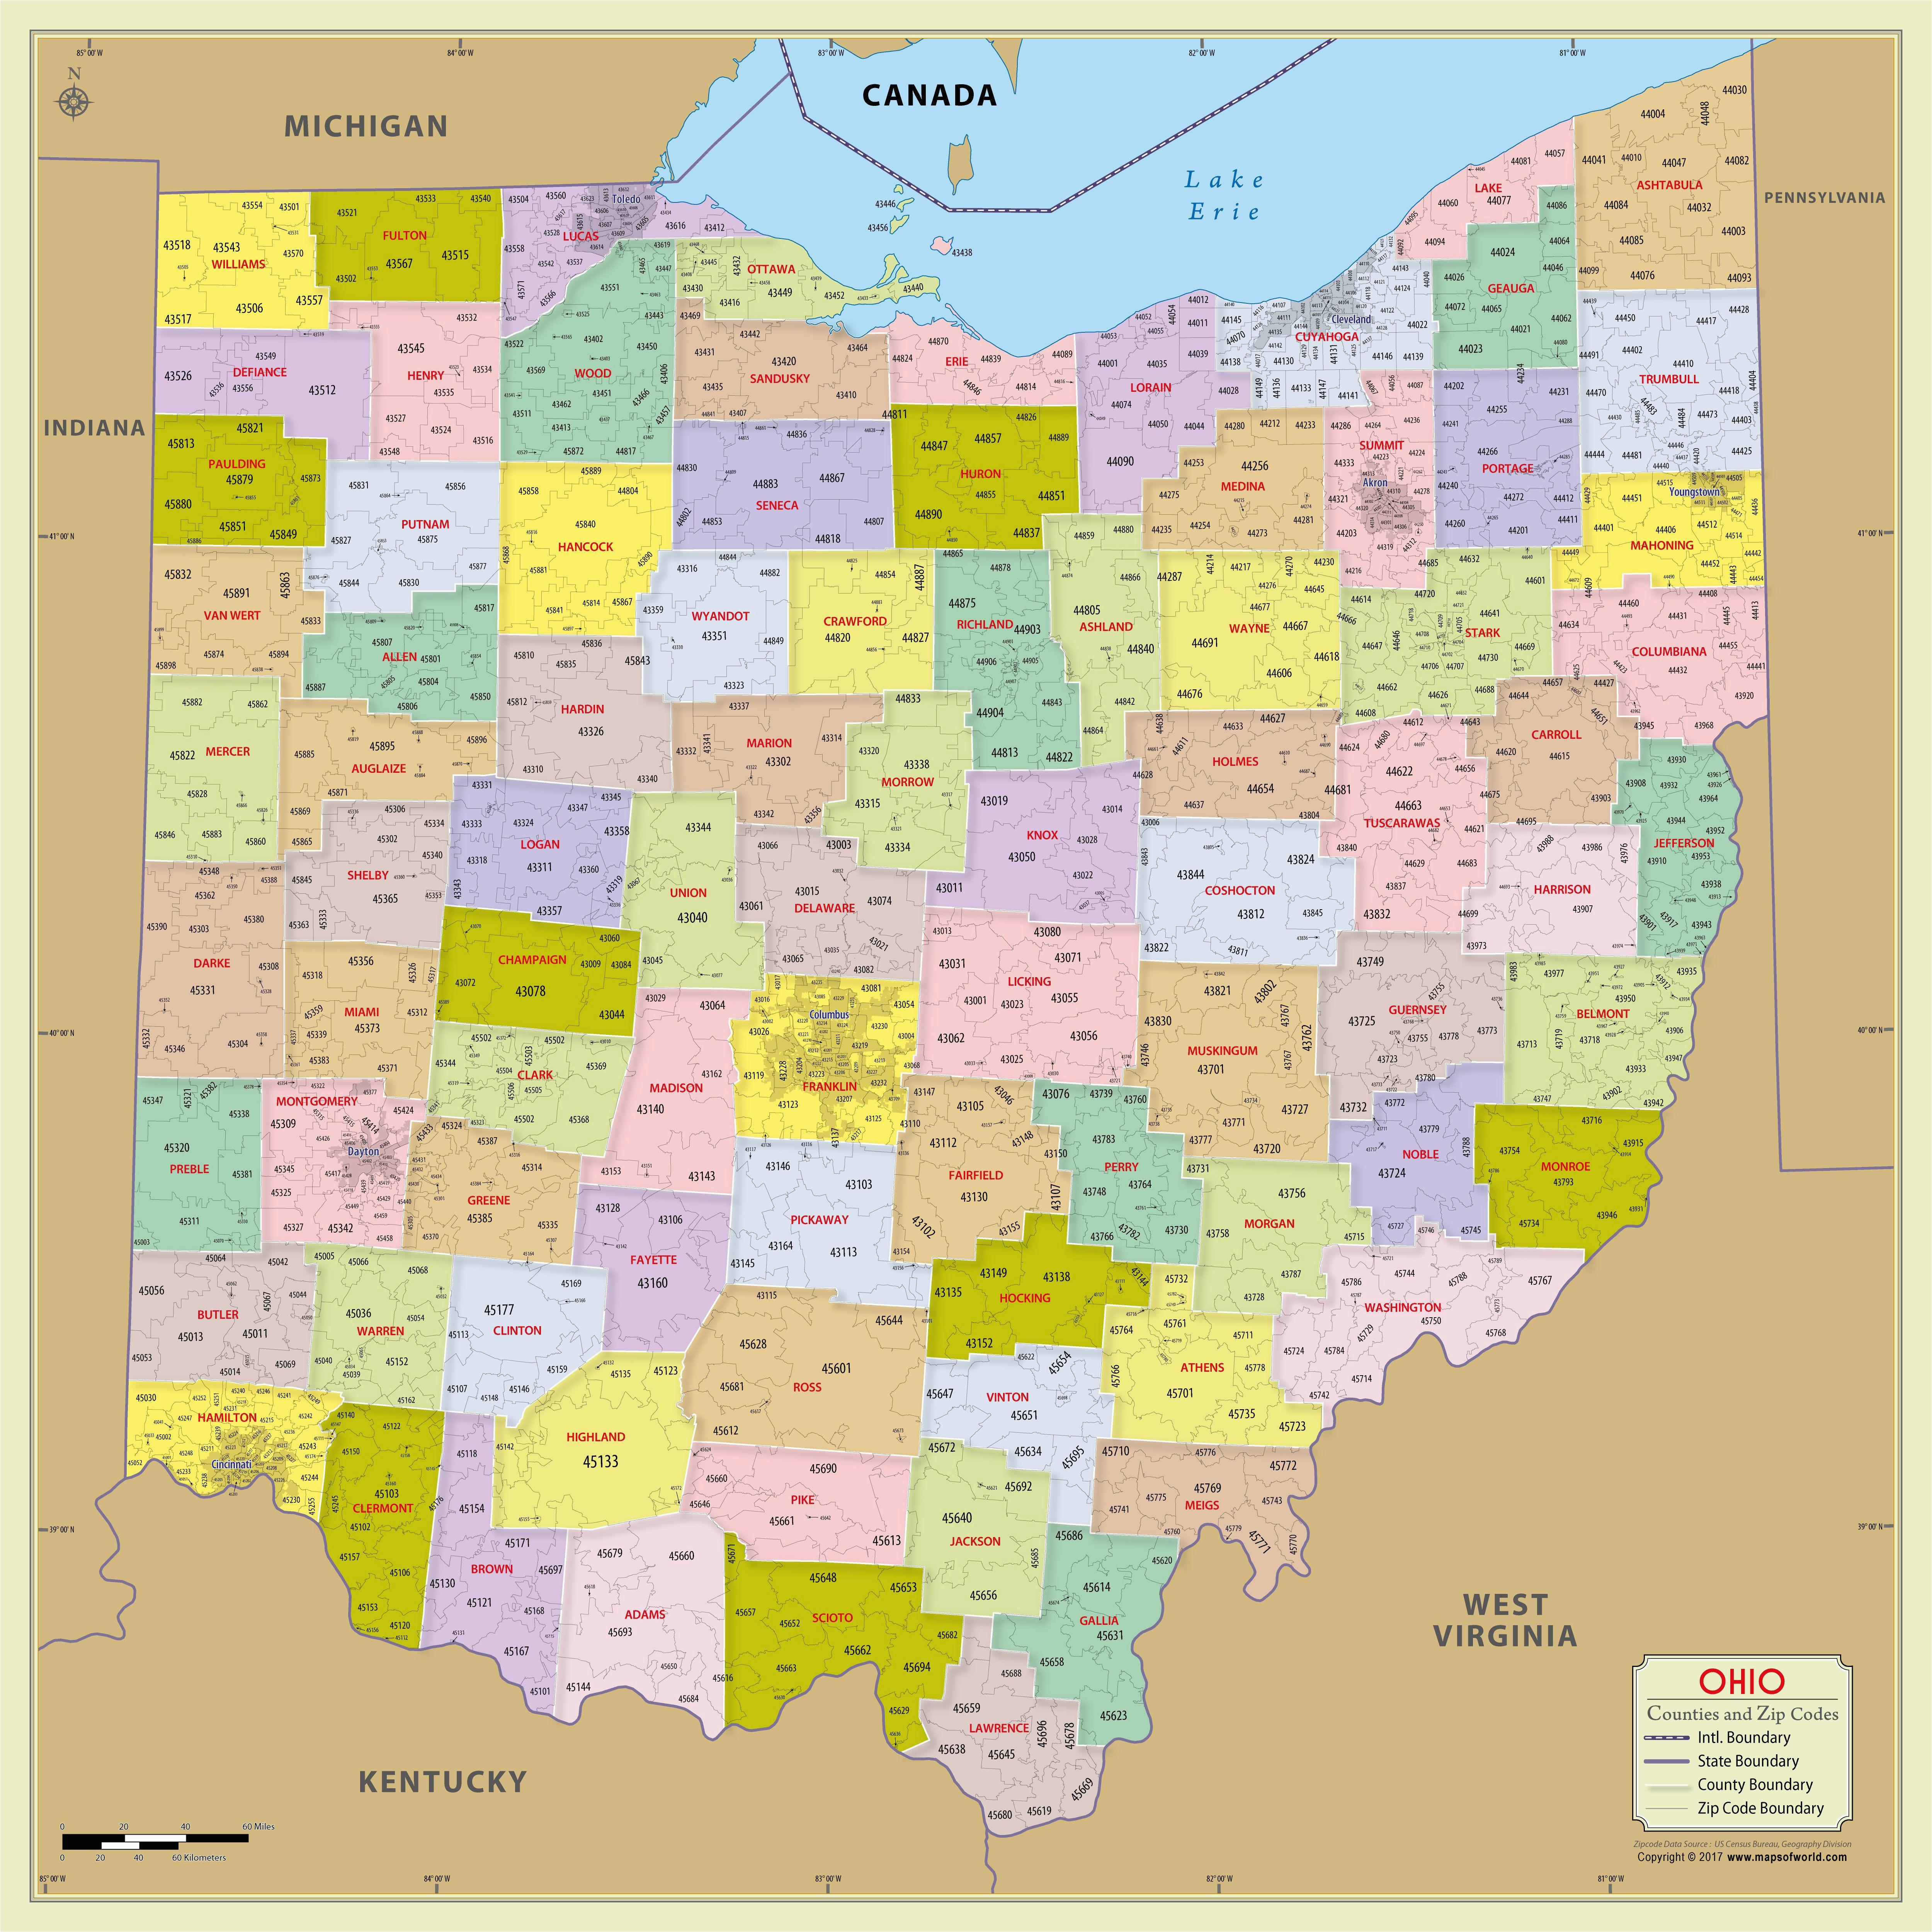 bellevue ohio county map elegant map of washington cities washington